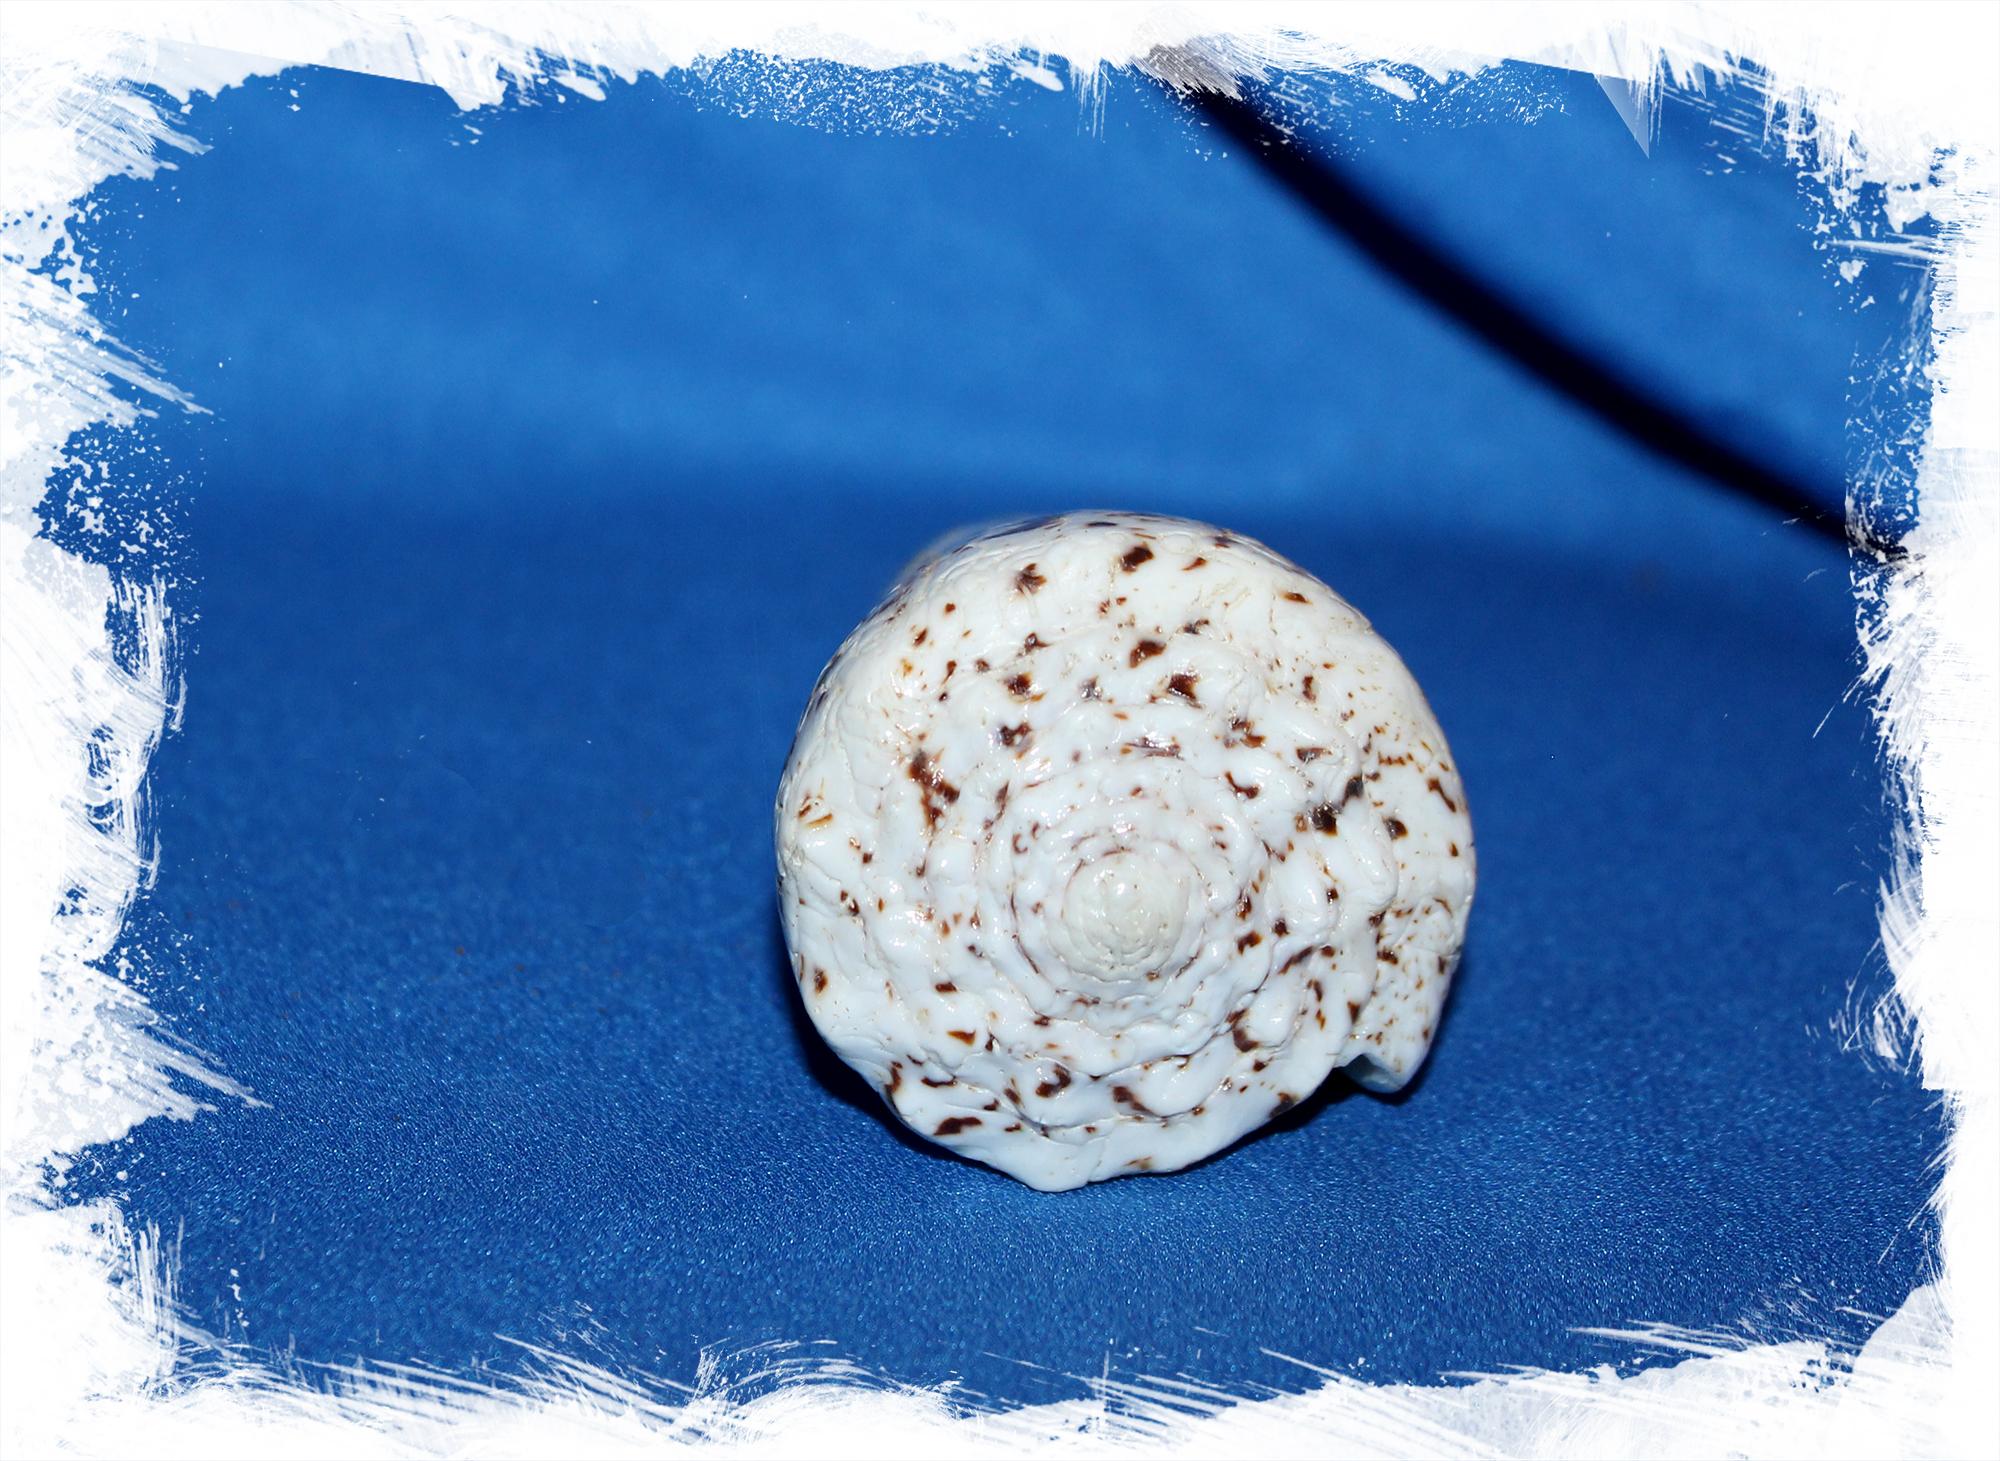 Раковина императорский Конус, Conus imperialis. Конус Империалис